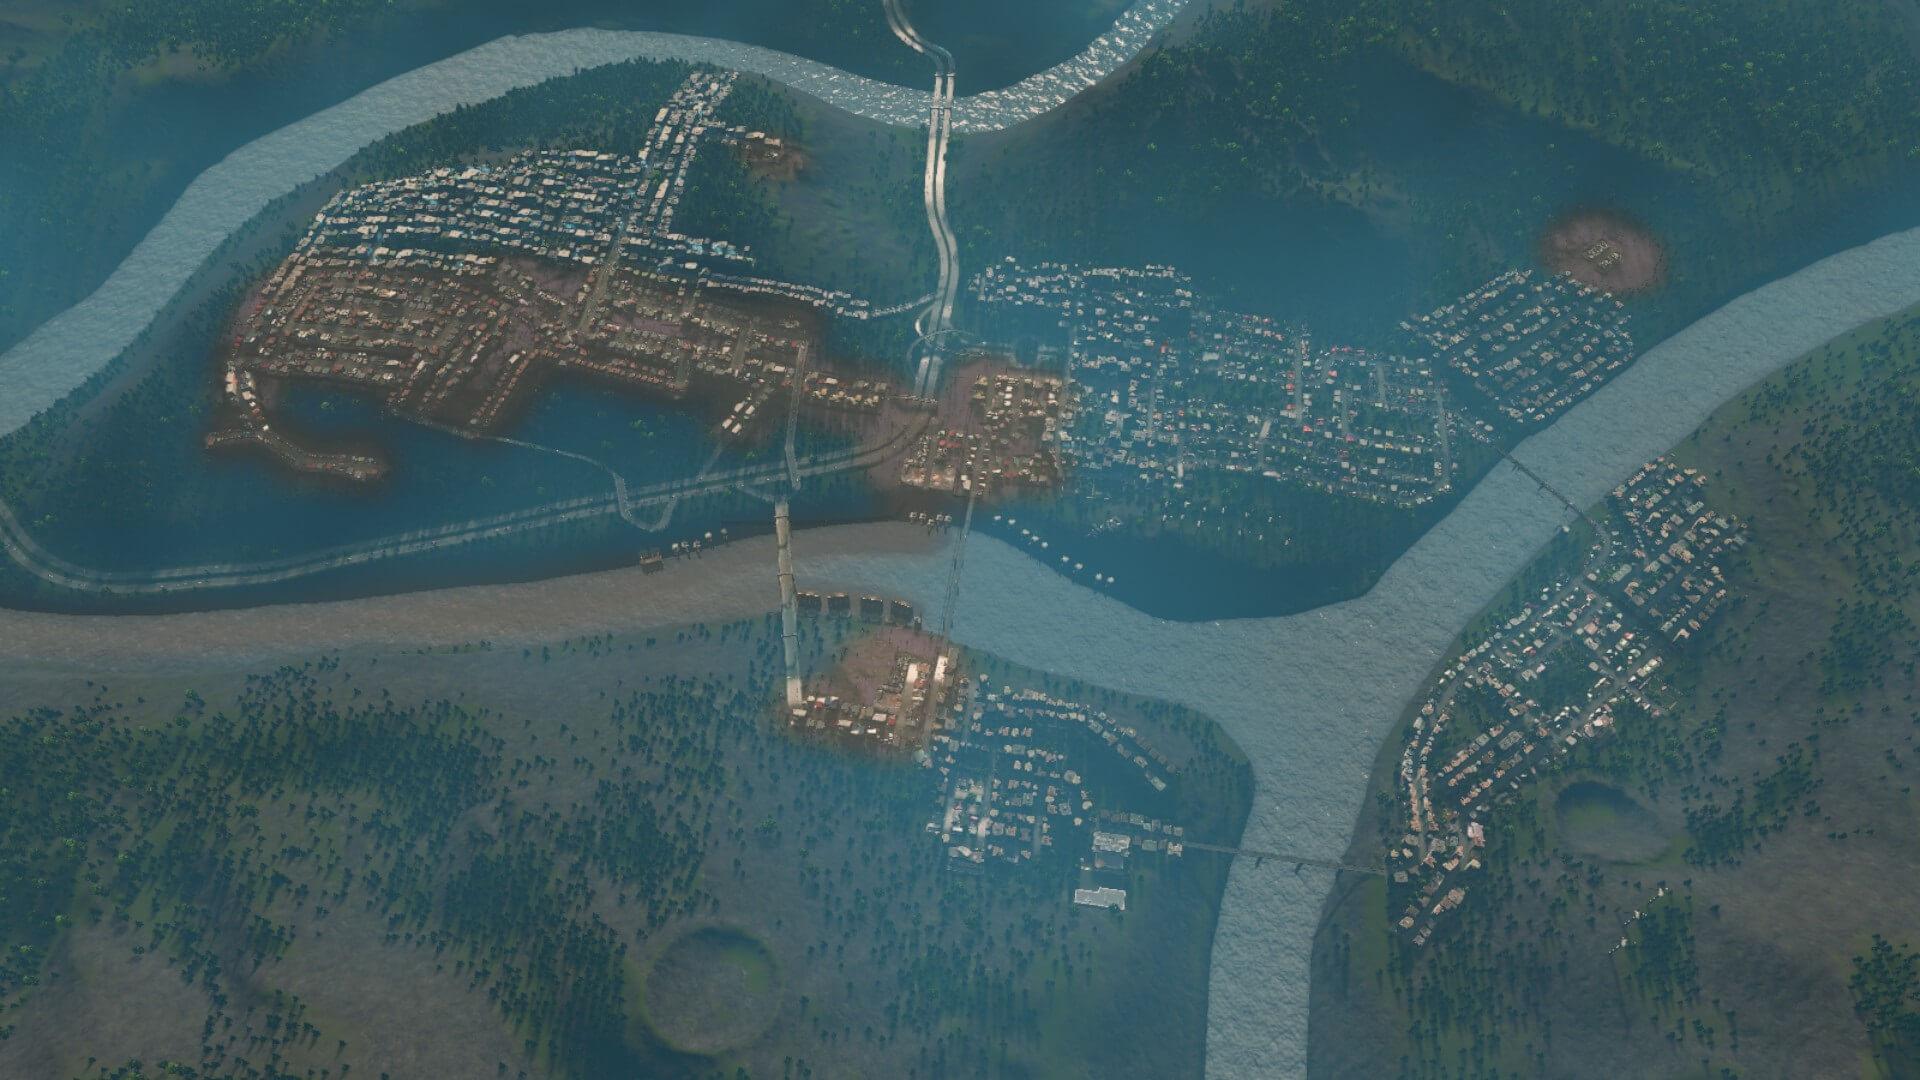 Achievement002-1024x576 【Cities:skylines 攻略ブログ】シナリオ アルパイン・ヴィレッジ 公共の交通機関で50万人を輸送する Cities:Skylines(シティーズ:スカイライン ) 街作りシミュレーションゲーム